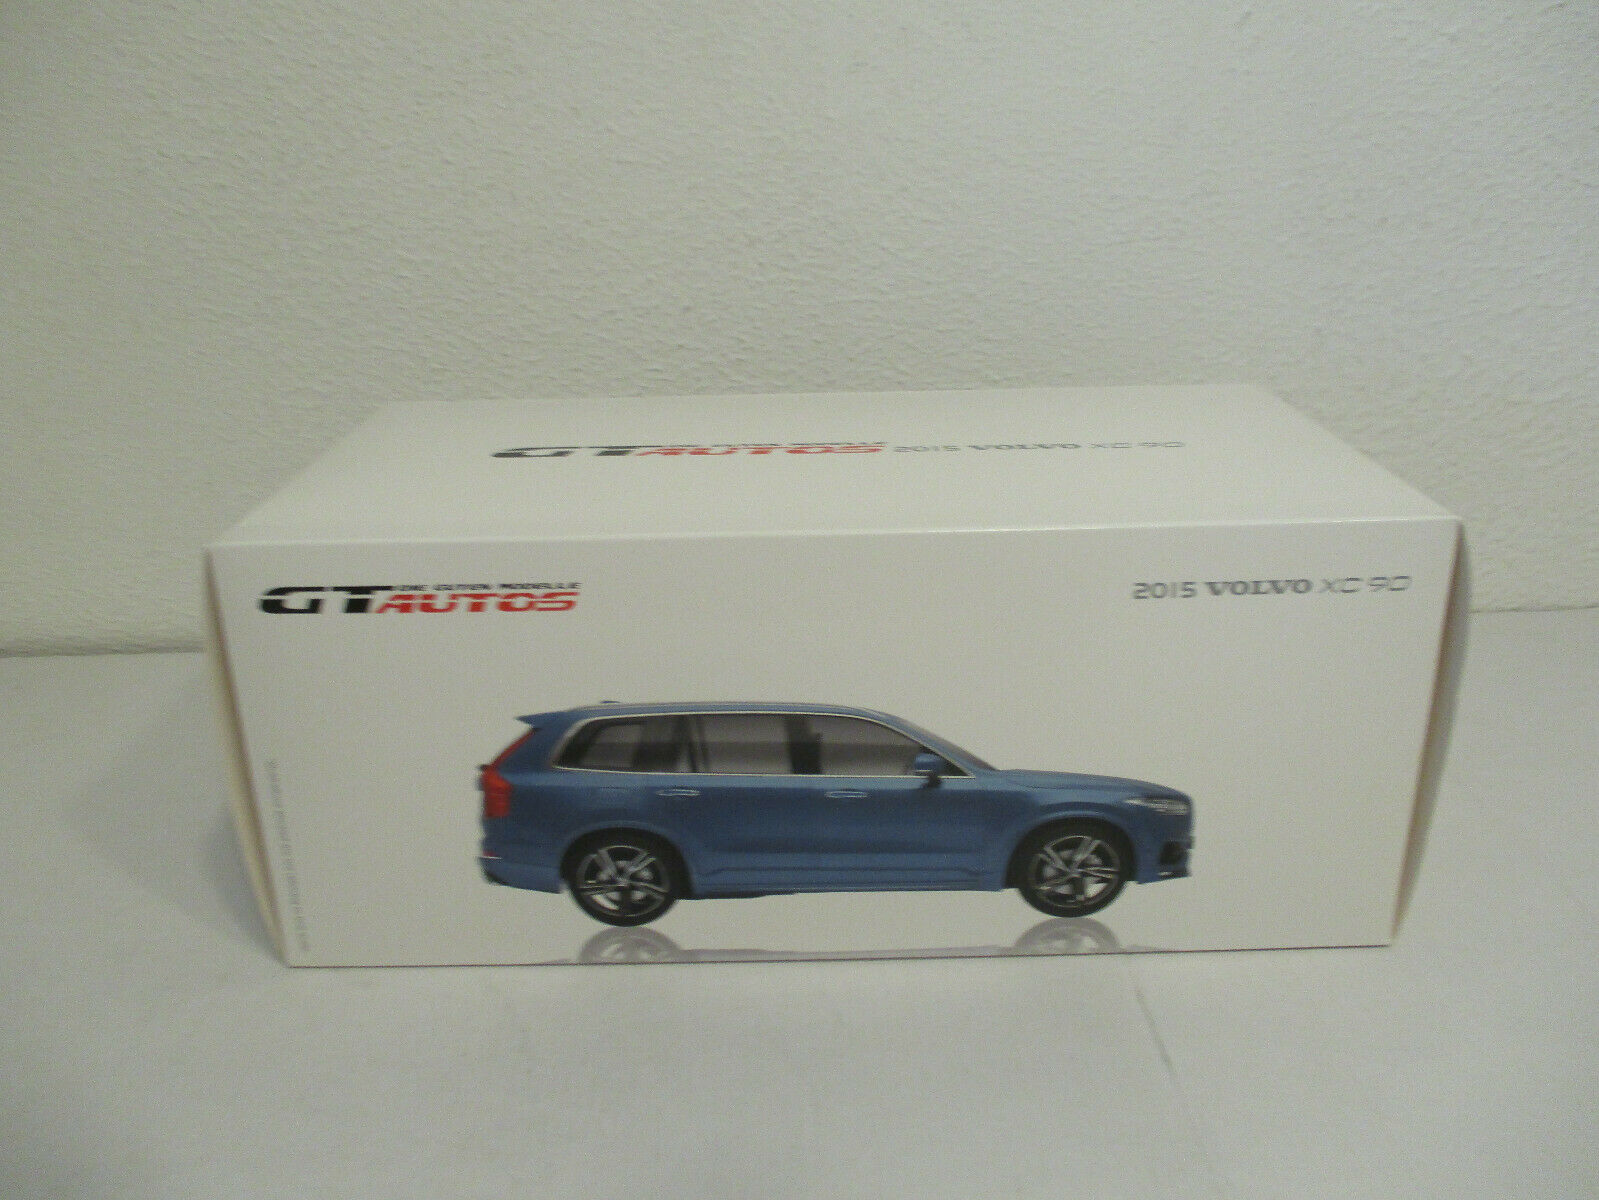 ( GOKR ) 1 18 GT Autos Volvo XC 90 NEU OVP